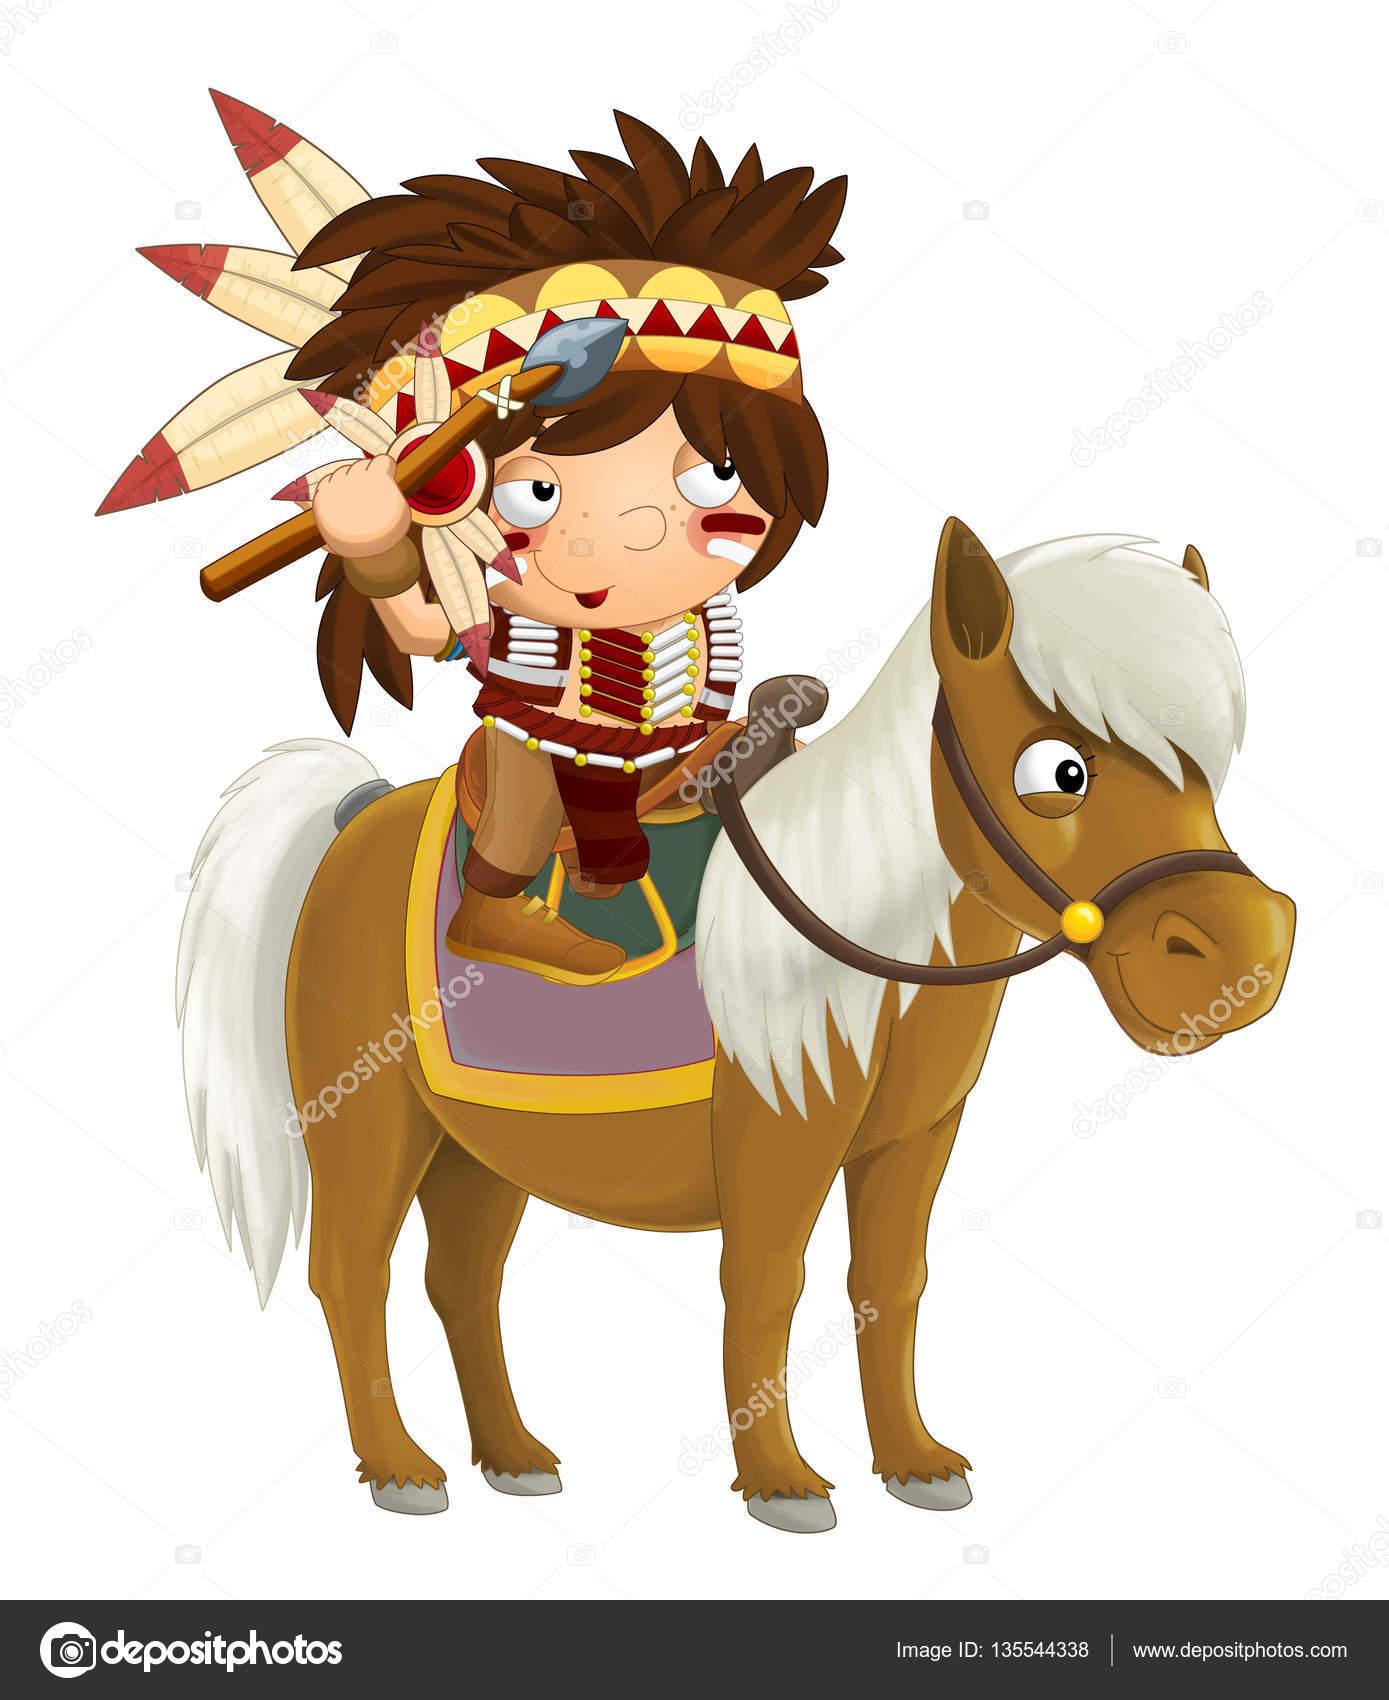 Dessin anim occidental indien cheval photographie illustrator hft 135544338 - Dessin anime indien cheval ...